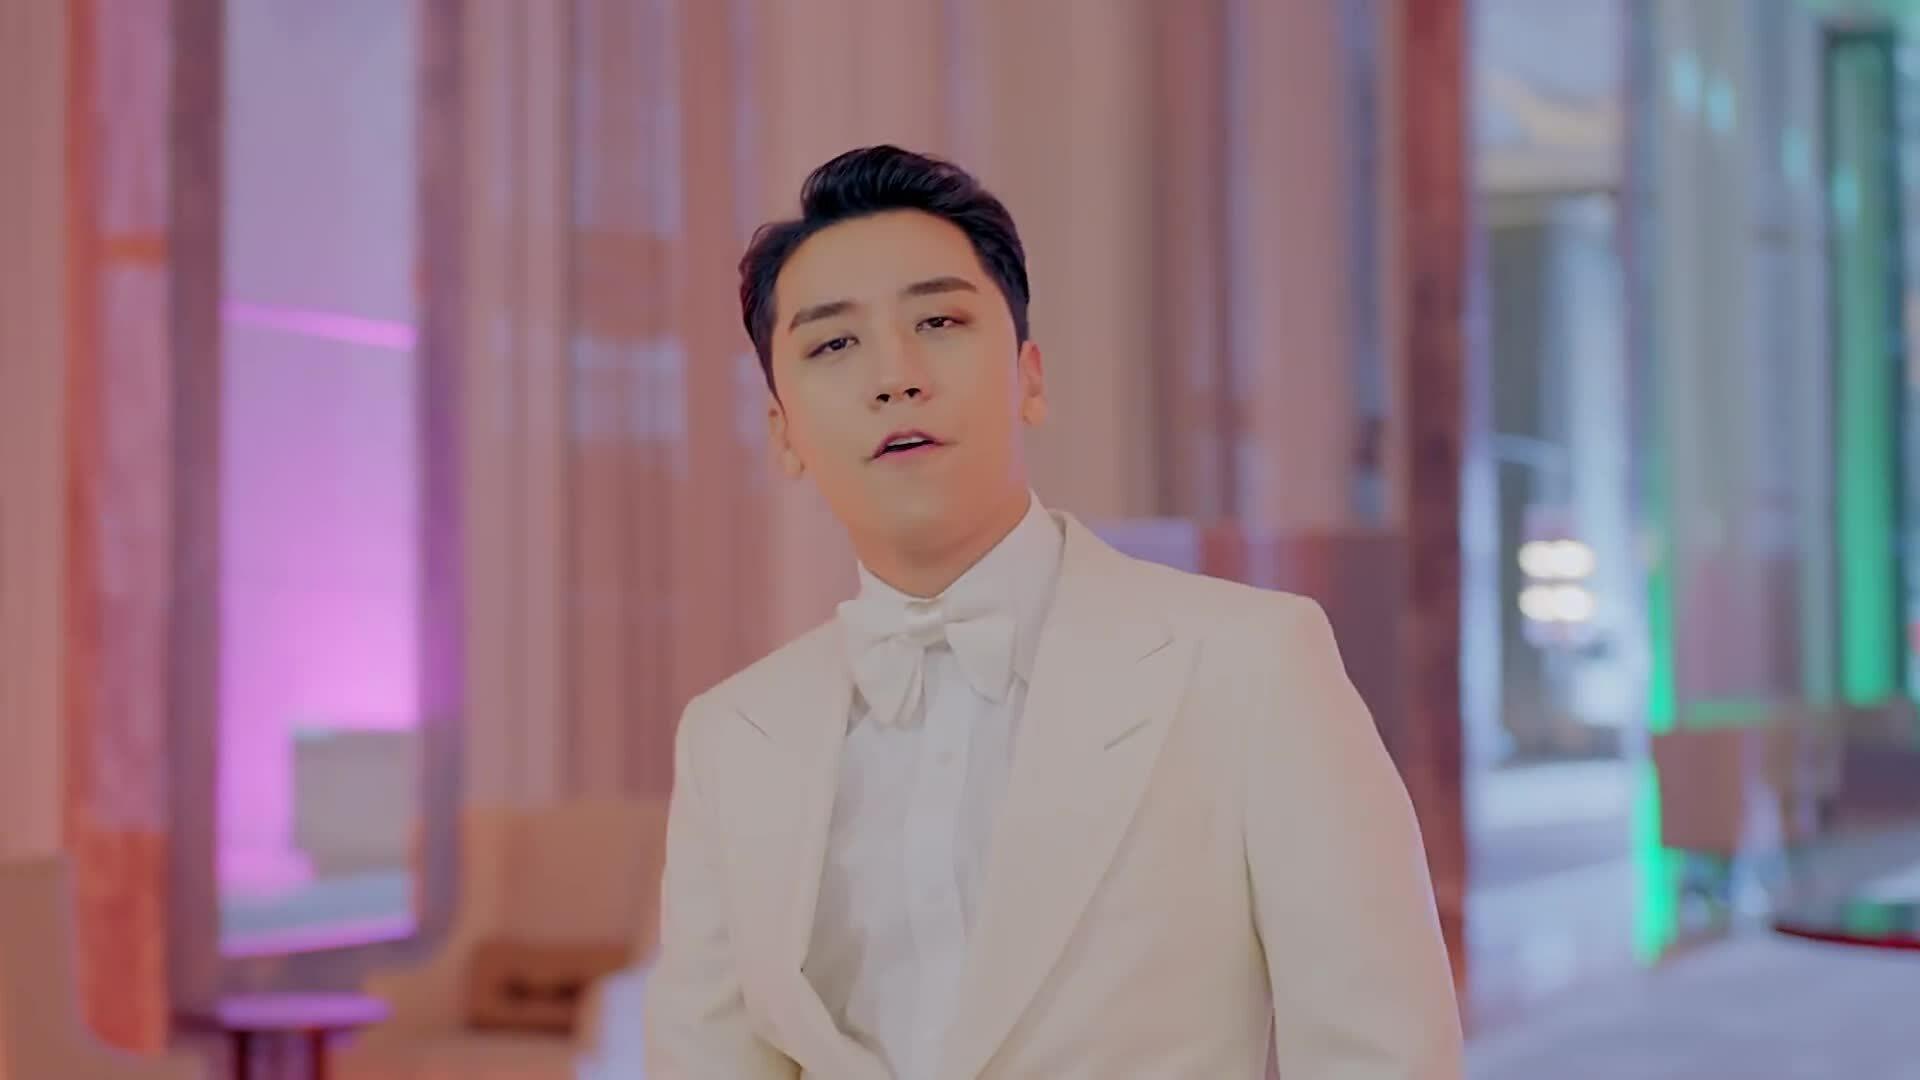 Where r u from của Seungri